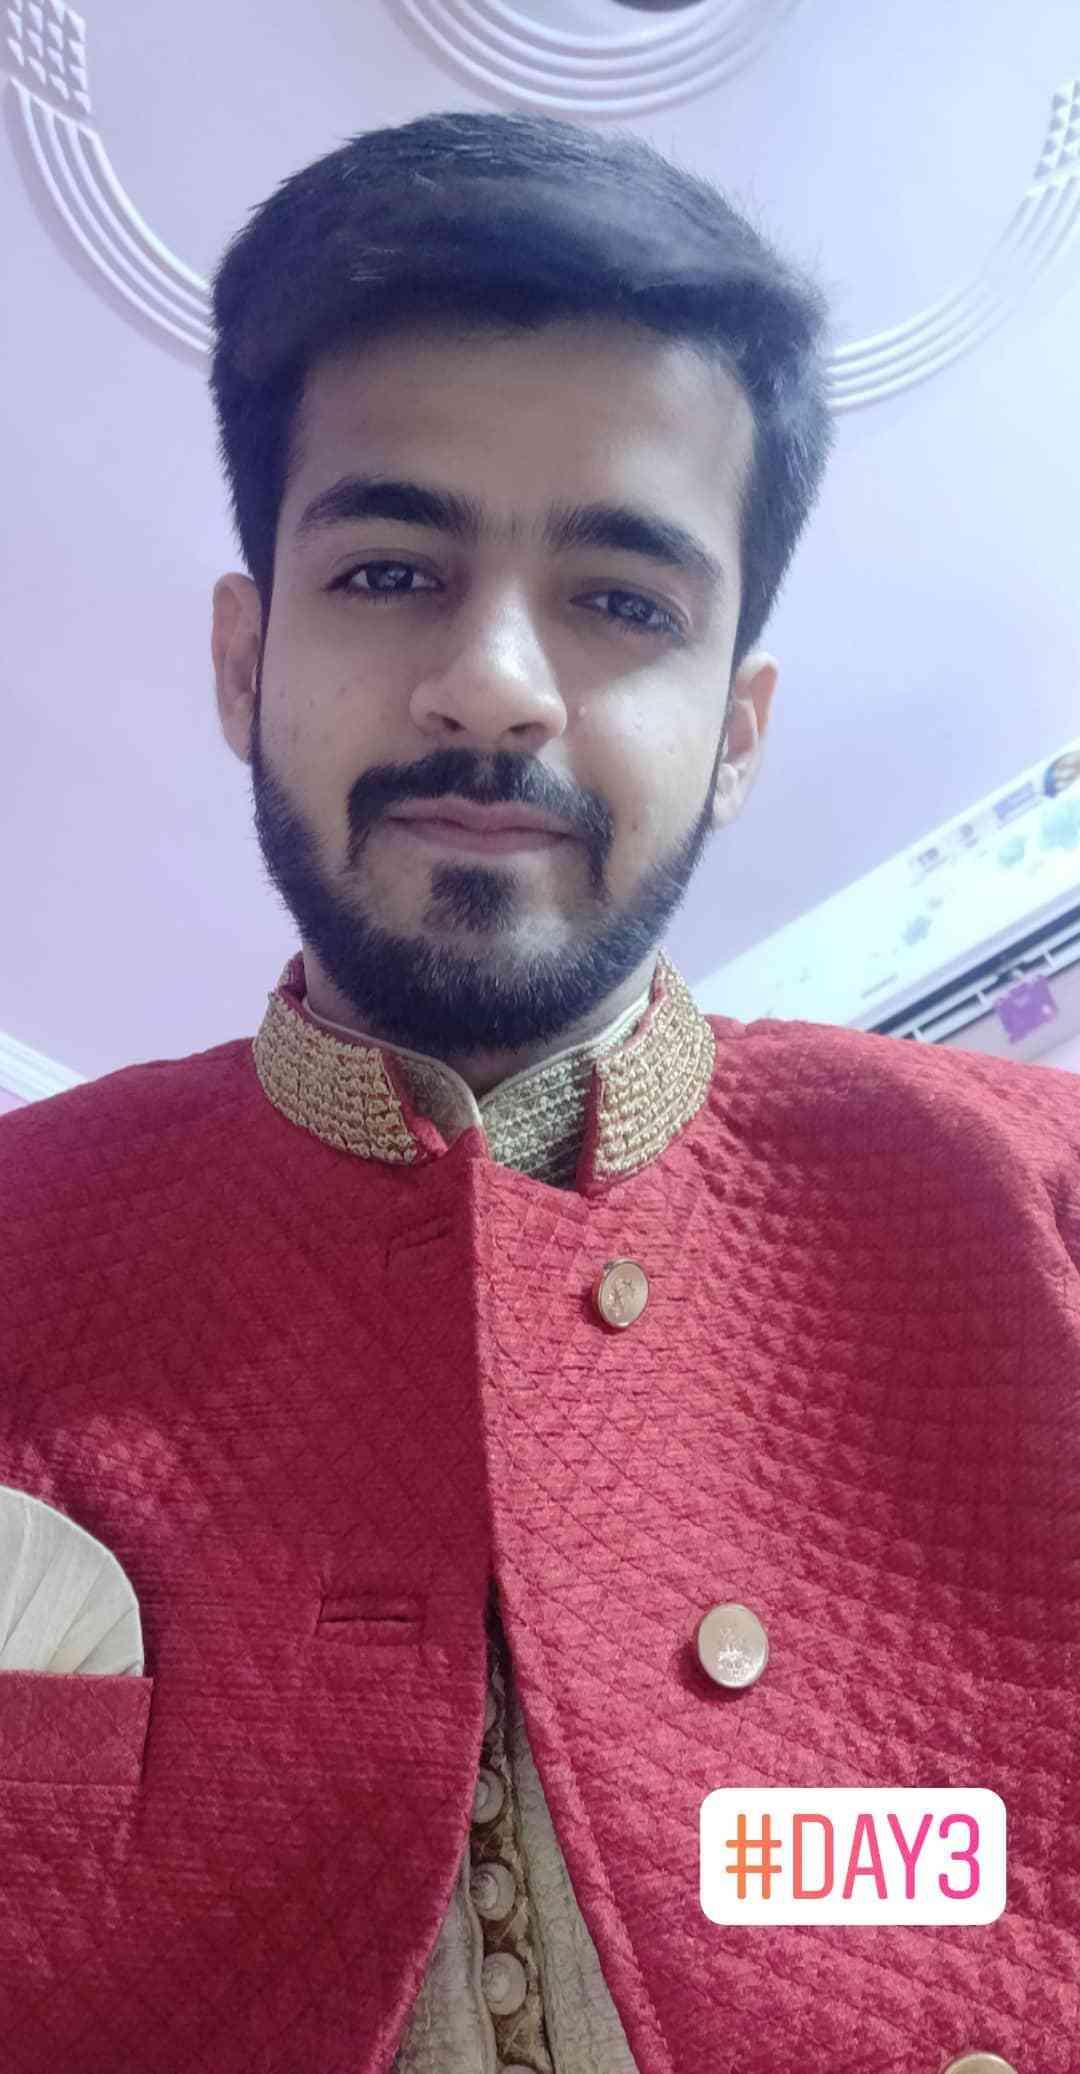 avatar of Sameer Chhabra